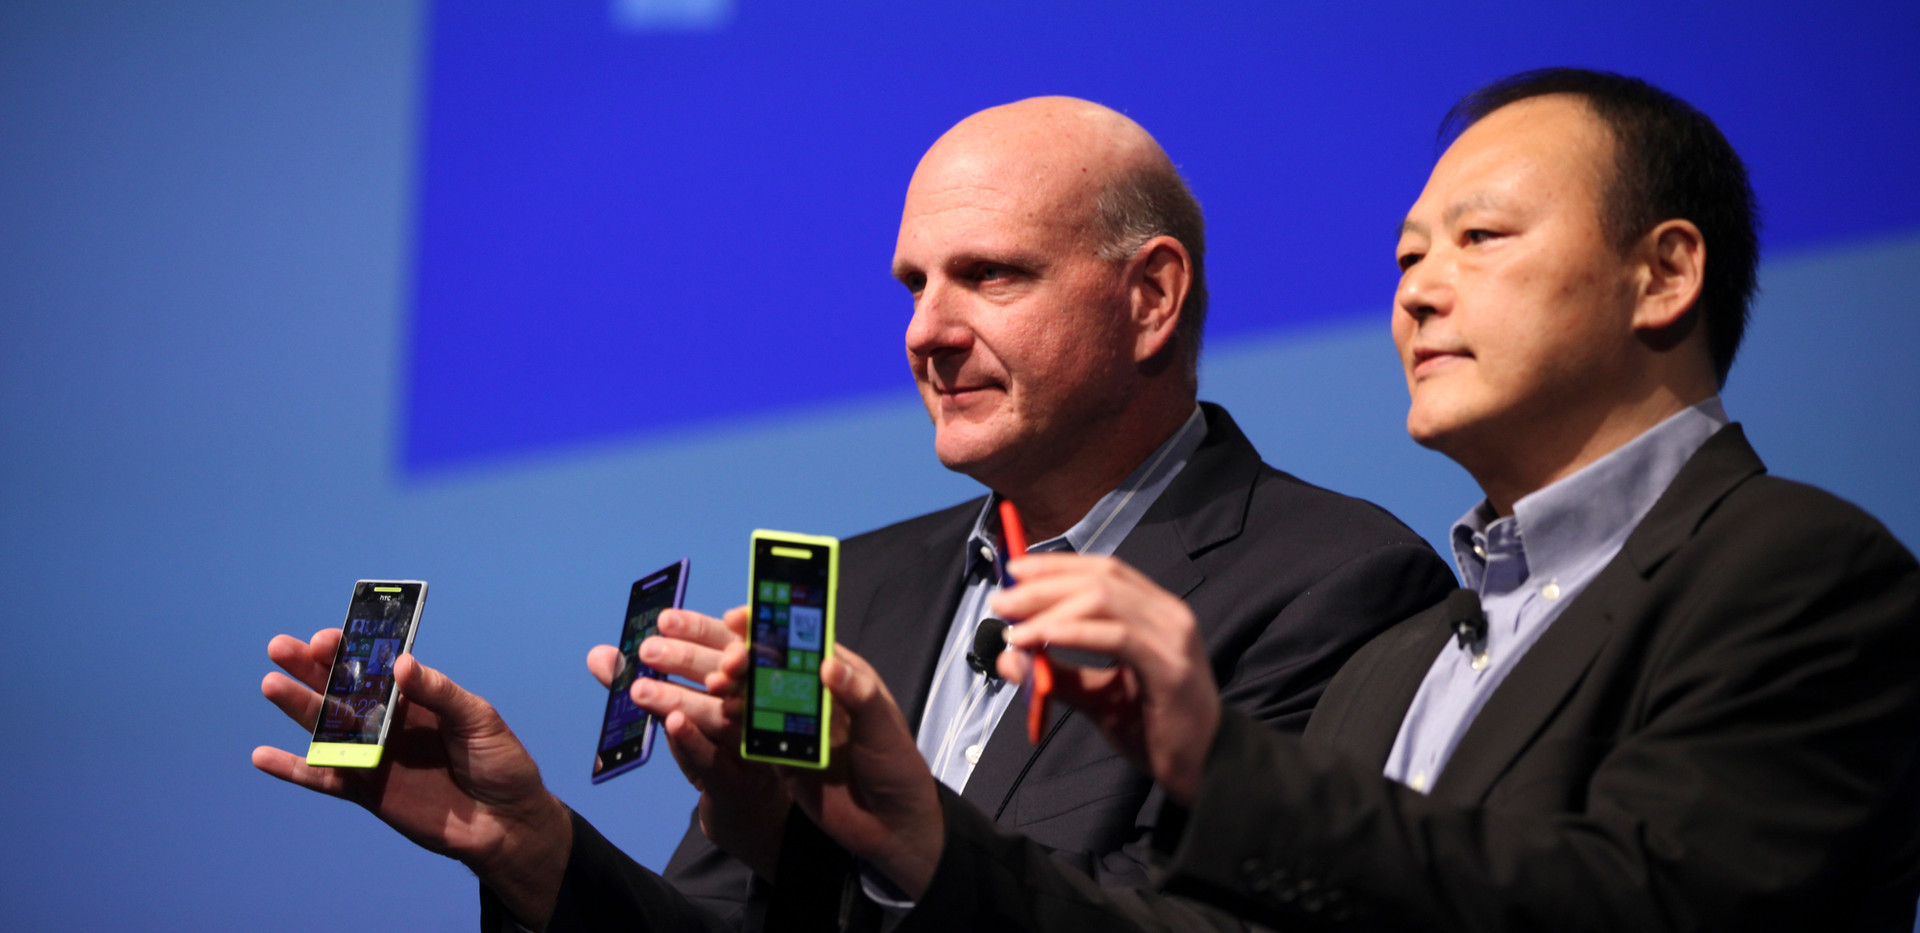 Windows Phone from HTC